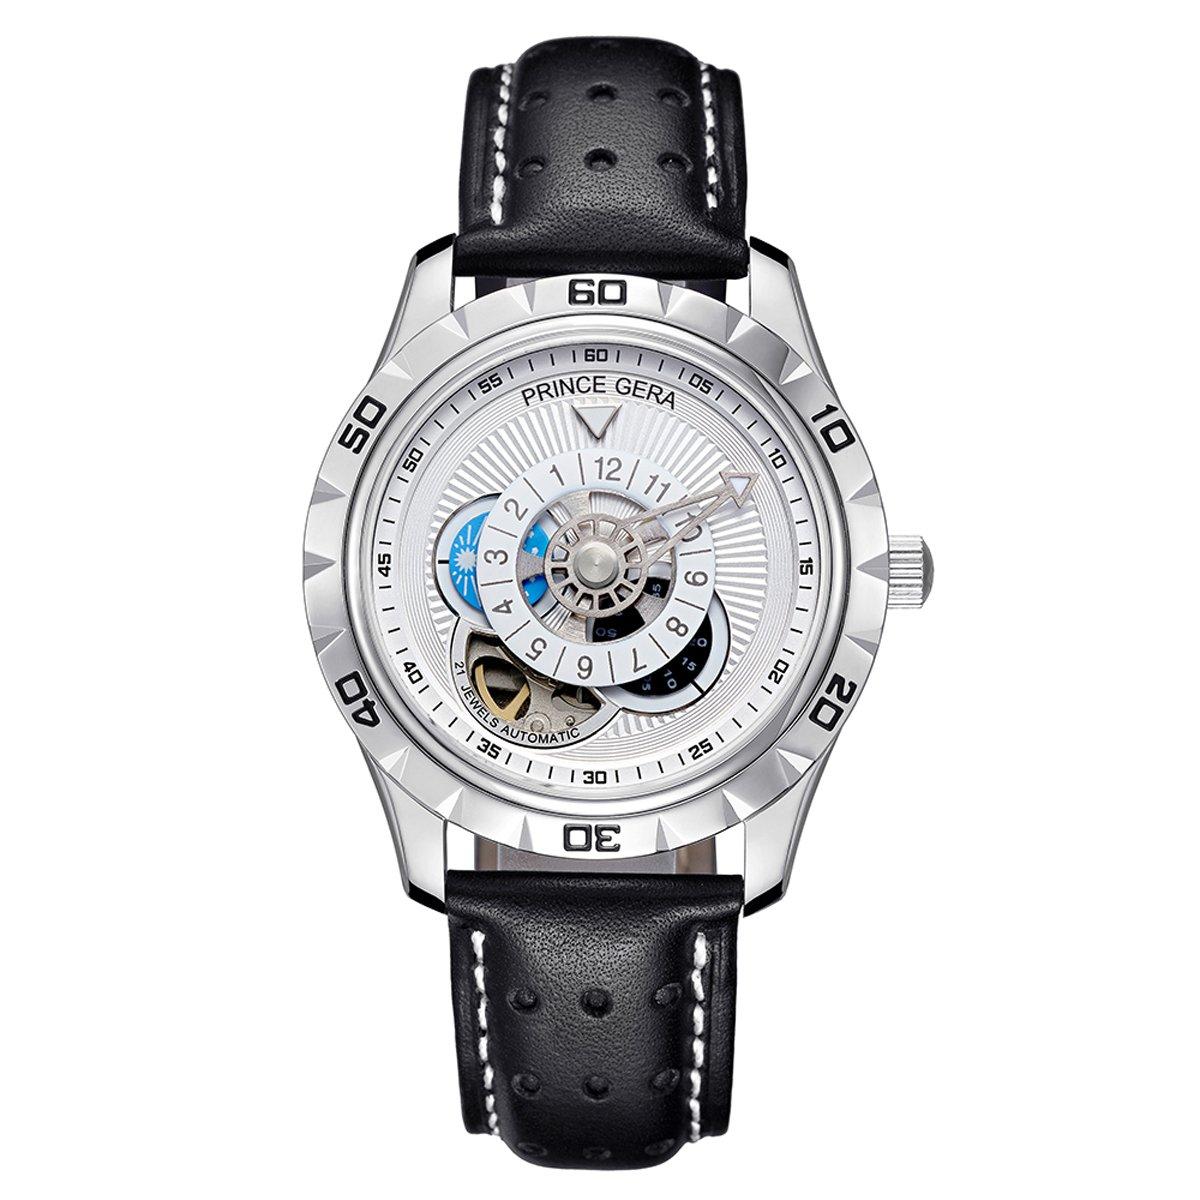 PRINCE GERA Men'Automatic Waterproof Watch Luminous Hands Watches for Men